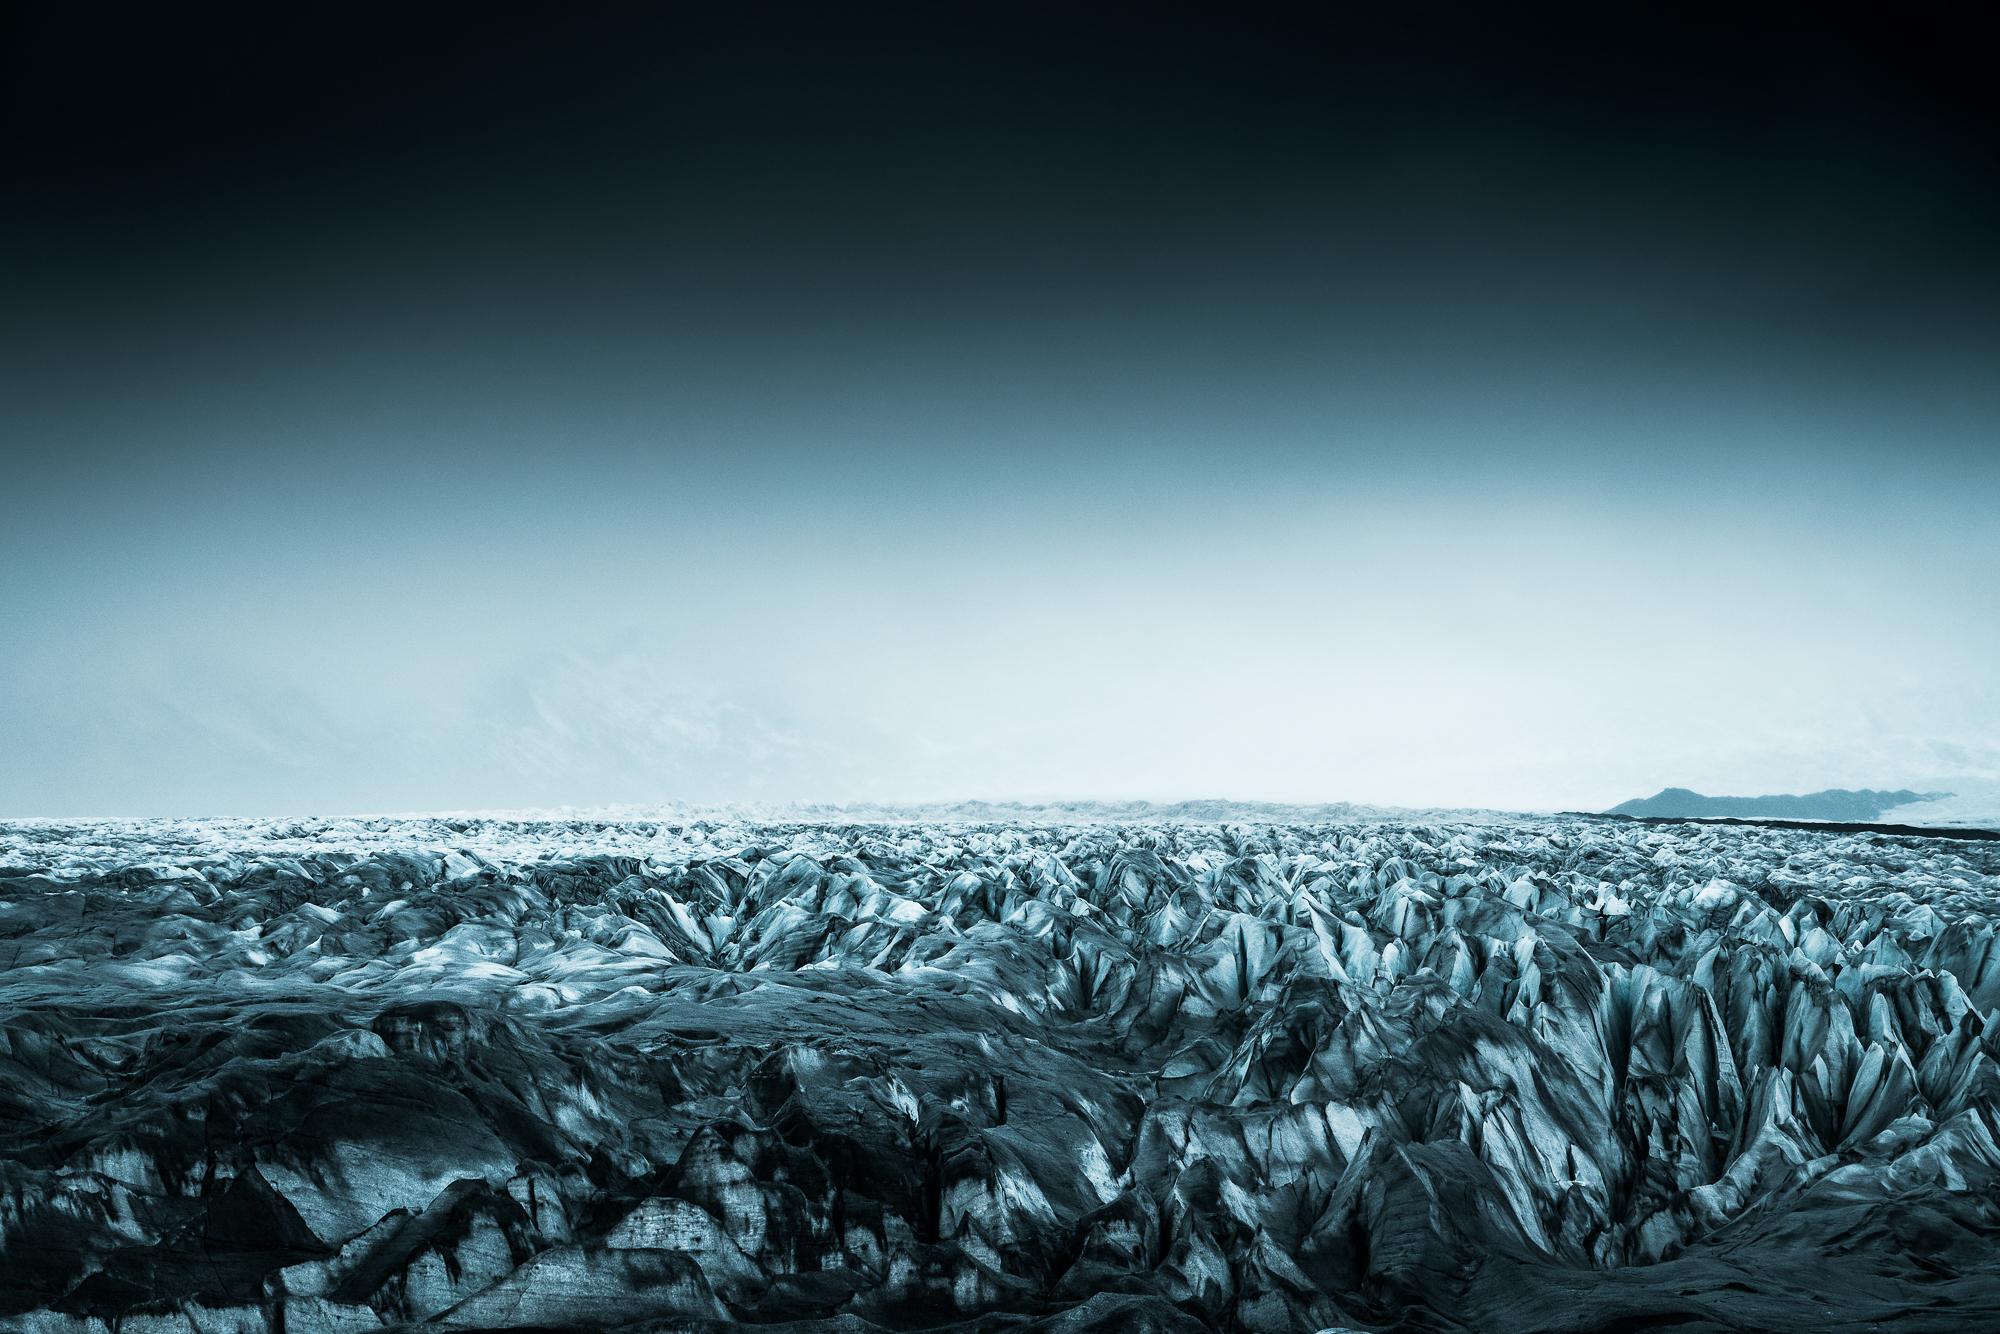 Skaftafellsjökull_Landscape_Island_Instagram__DSC4384-Bearbeitet.jpg